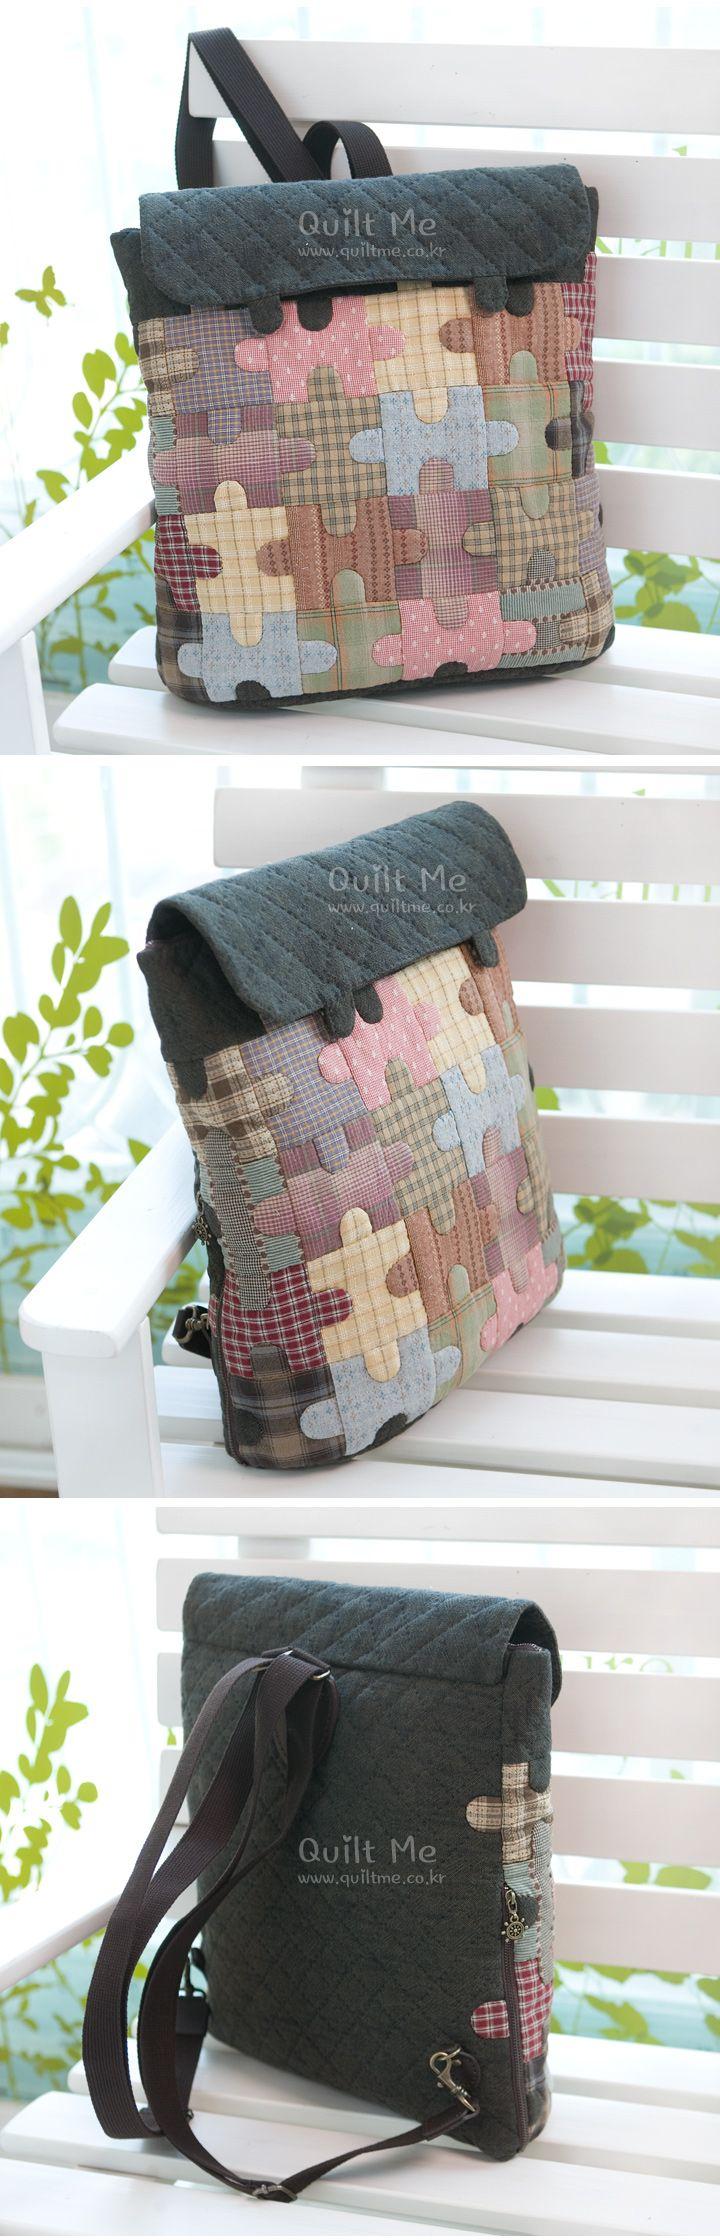 berbagai kerajinan tas dari bahan bekas yang membuat penampilan kita tambah beutiful.....dan buat alam menjadi indah dan lestari